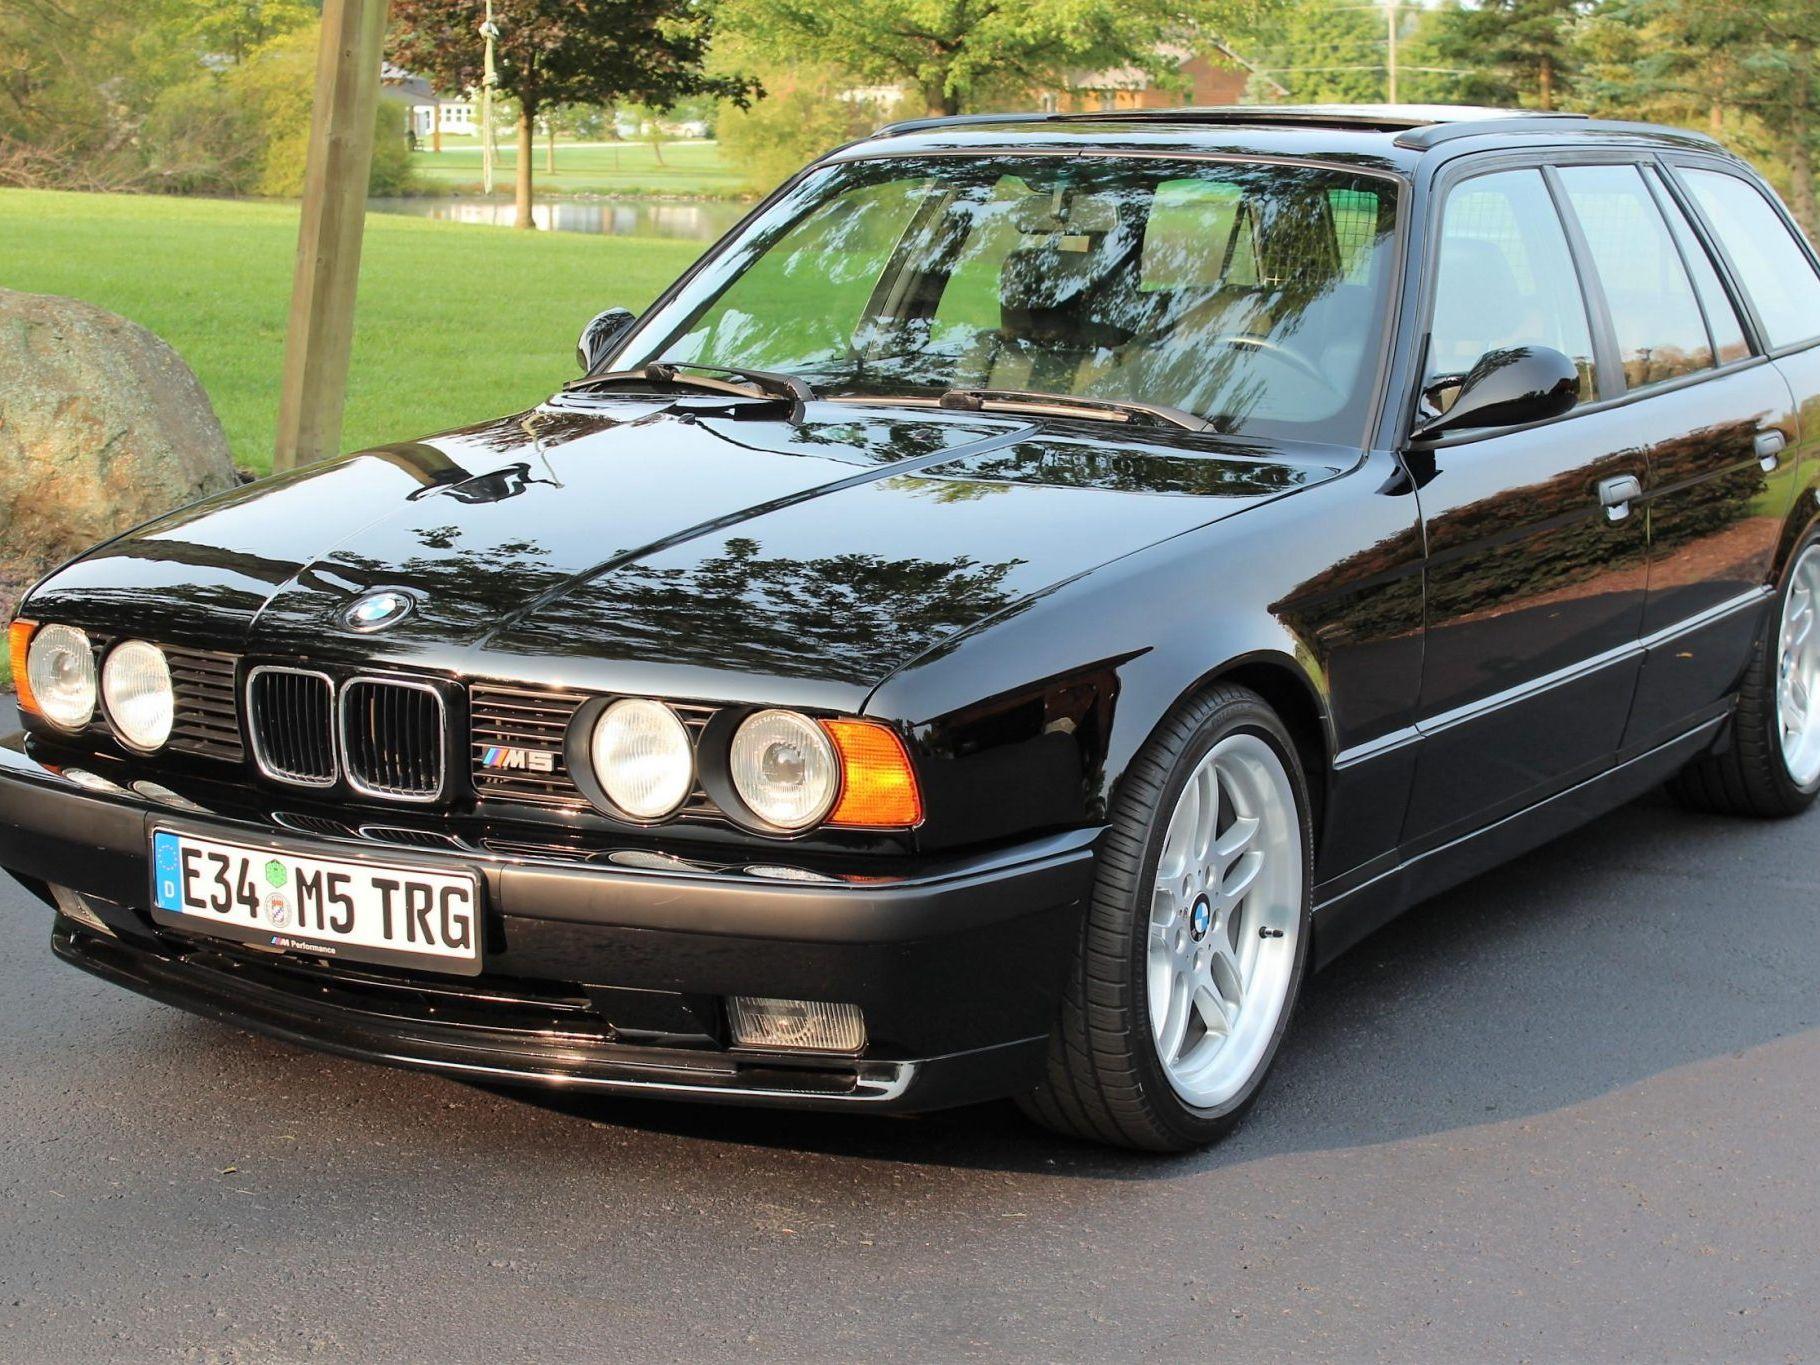 1992 BMW 525i Touring 5-Speed